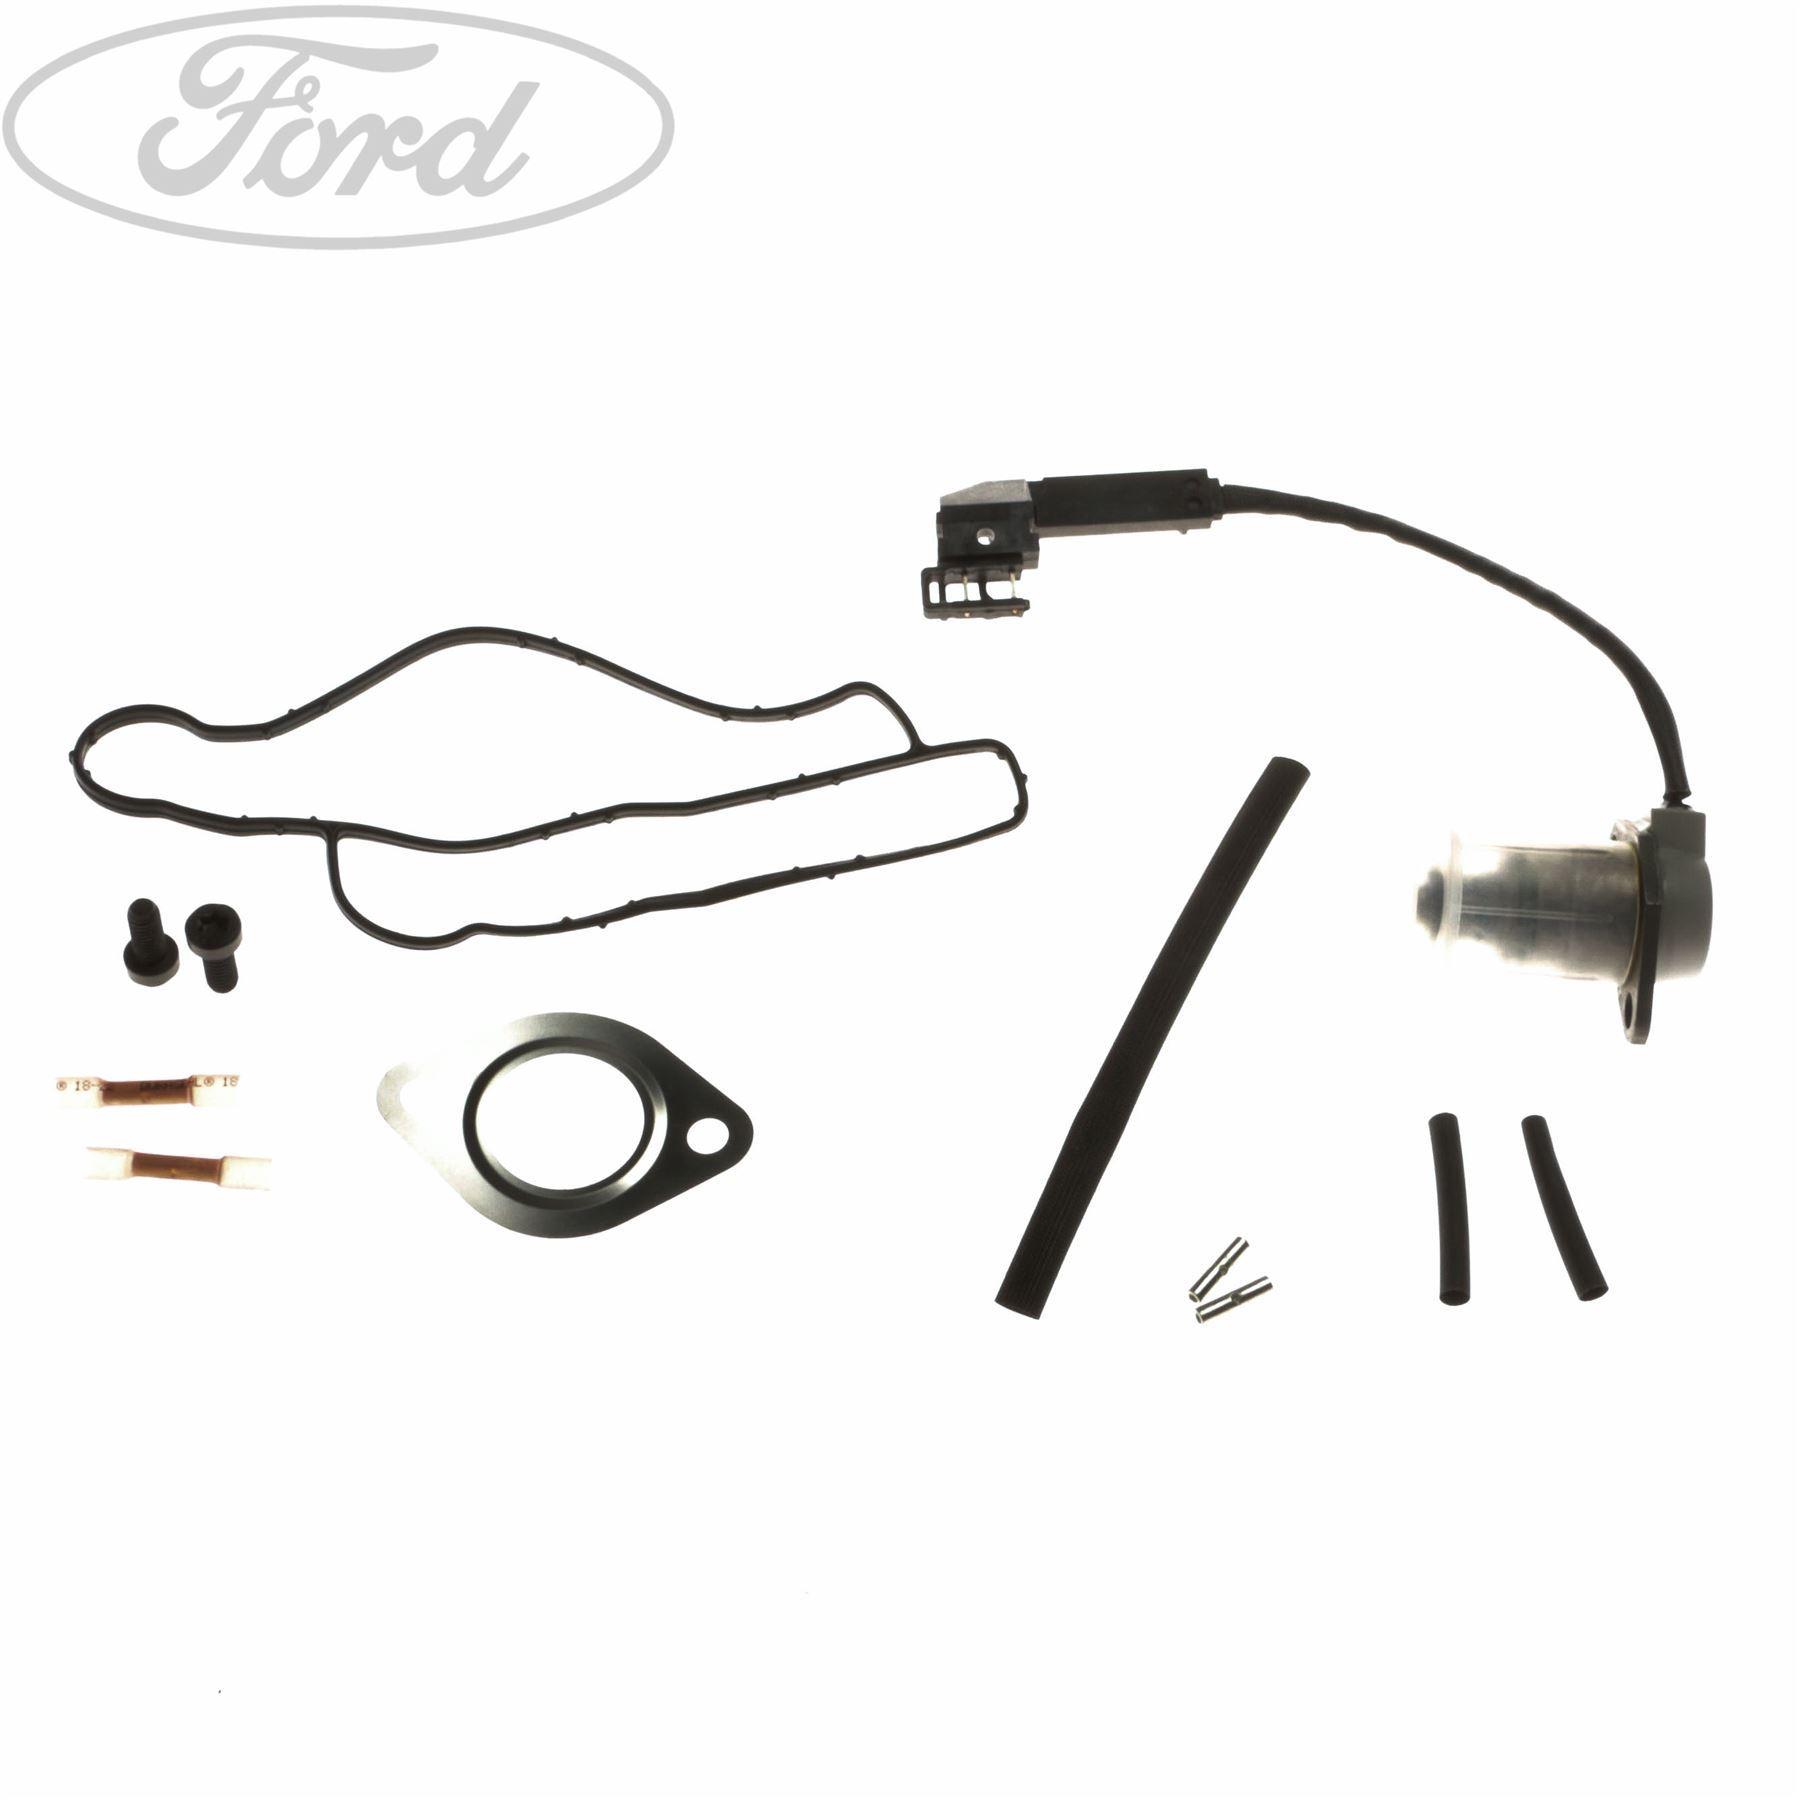 Genuine Ford Fiesta MK4 Transit MK6 Fuel Injection